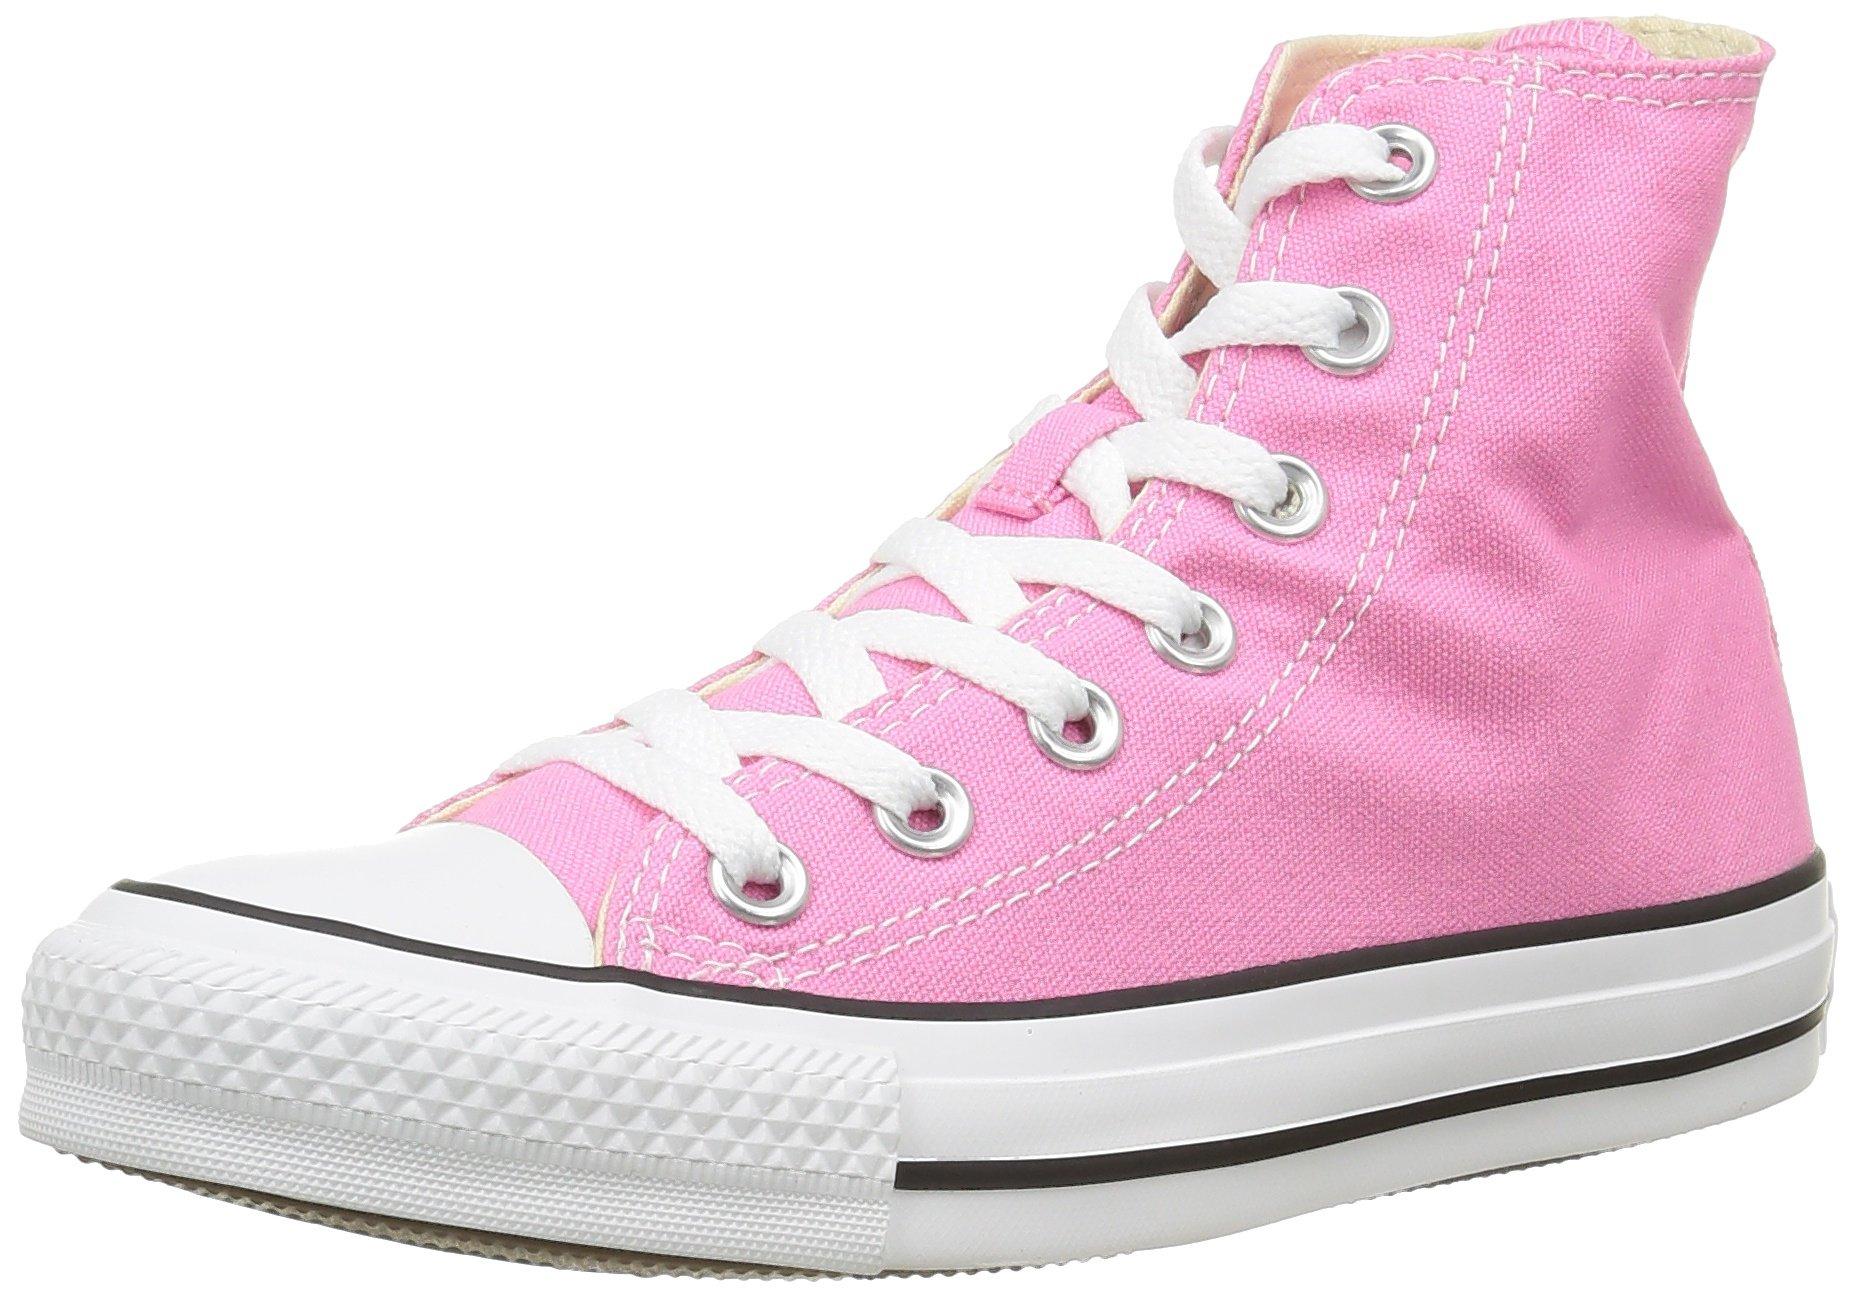 Converse Unisex Chuck Taylor Classic Hi Pink Sneaker - 6 Men - 8 Women by Converse